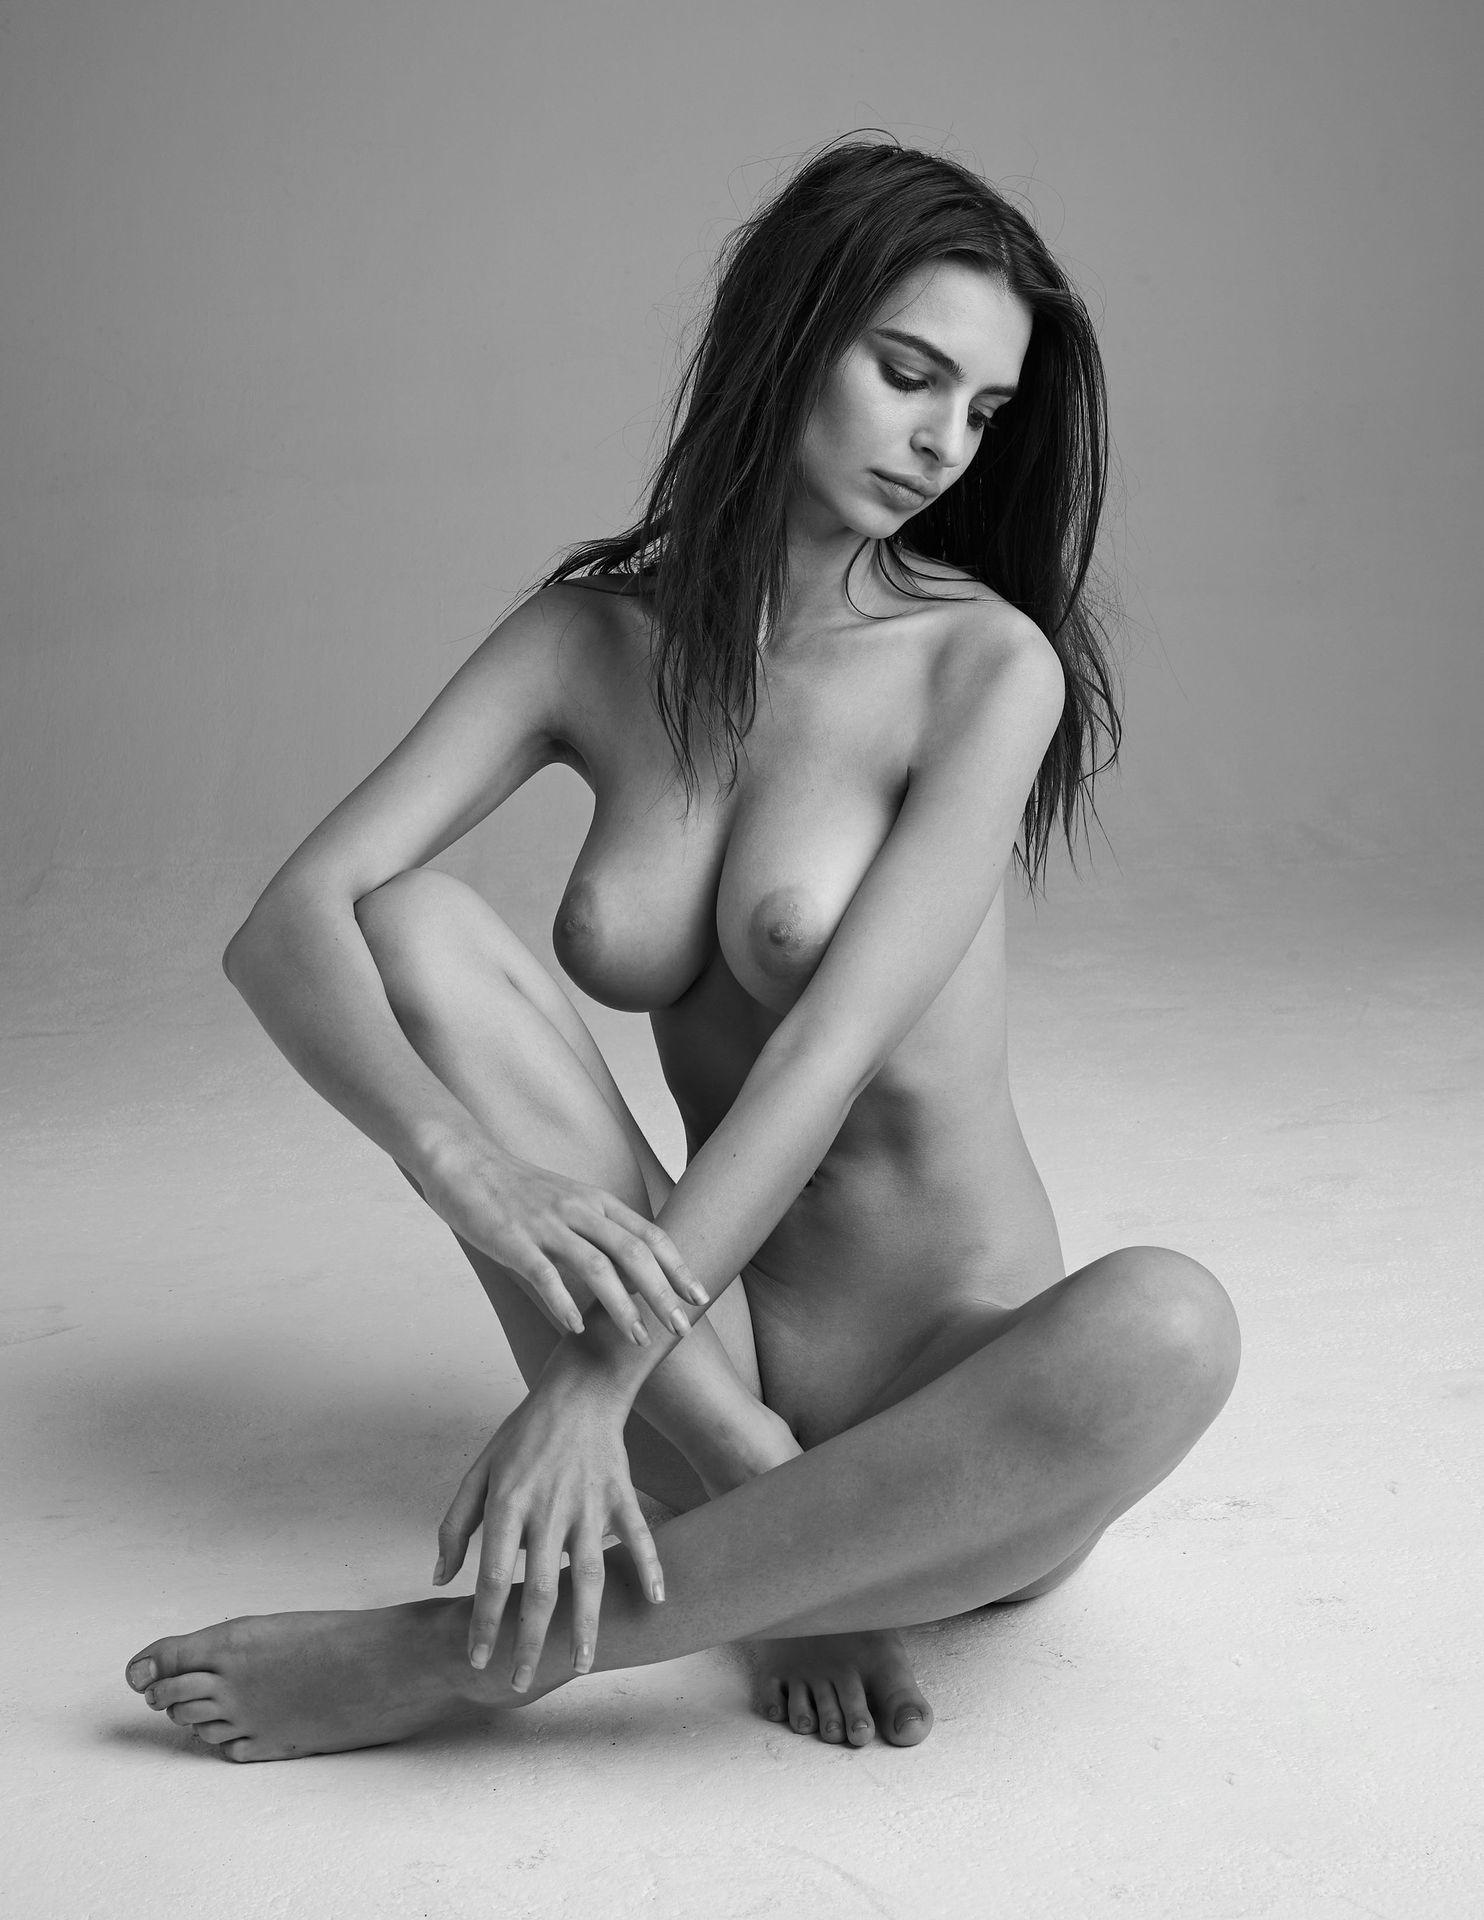 Emily-Ratajkowski-Nude-1-thefappeningblog.com_-1.jpg